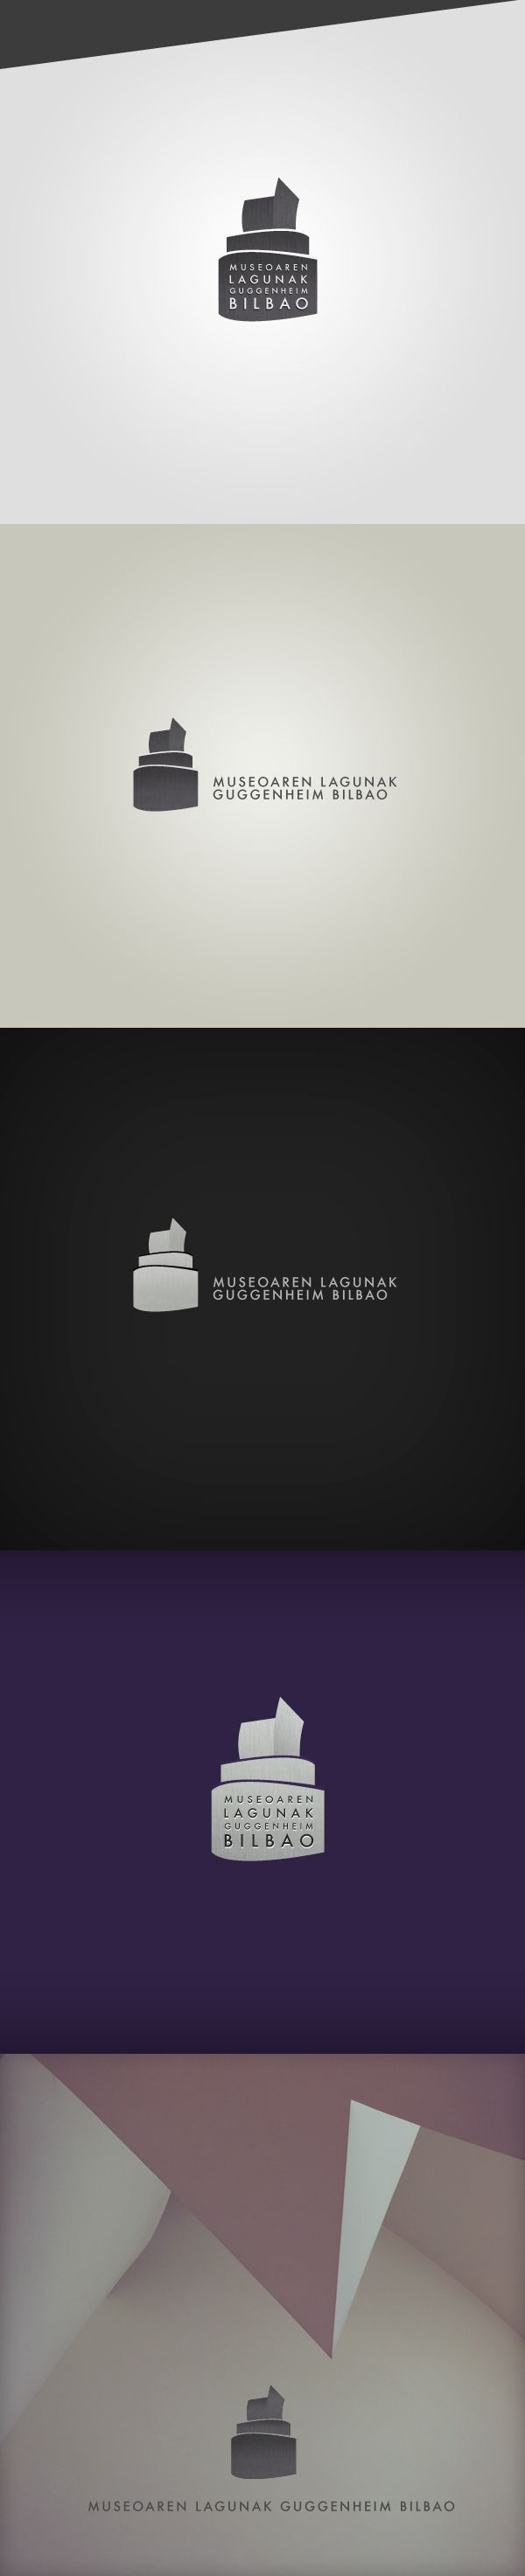 Friends of the Museum Guggenheim Bilbao - Identity by Federico Cerdà, via Behance